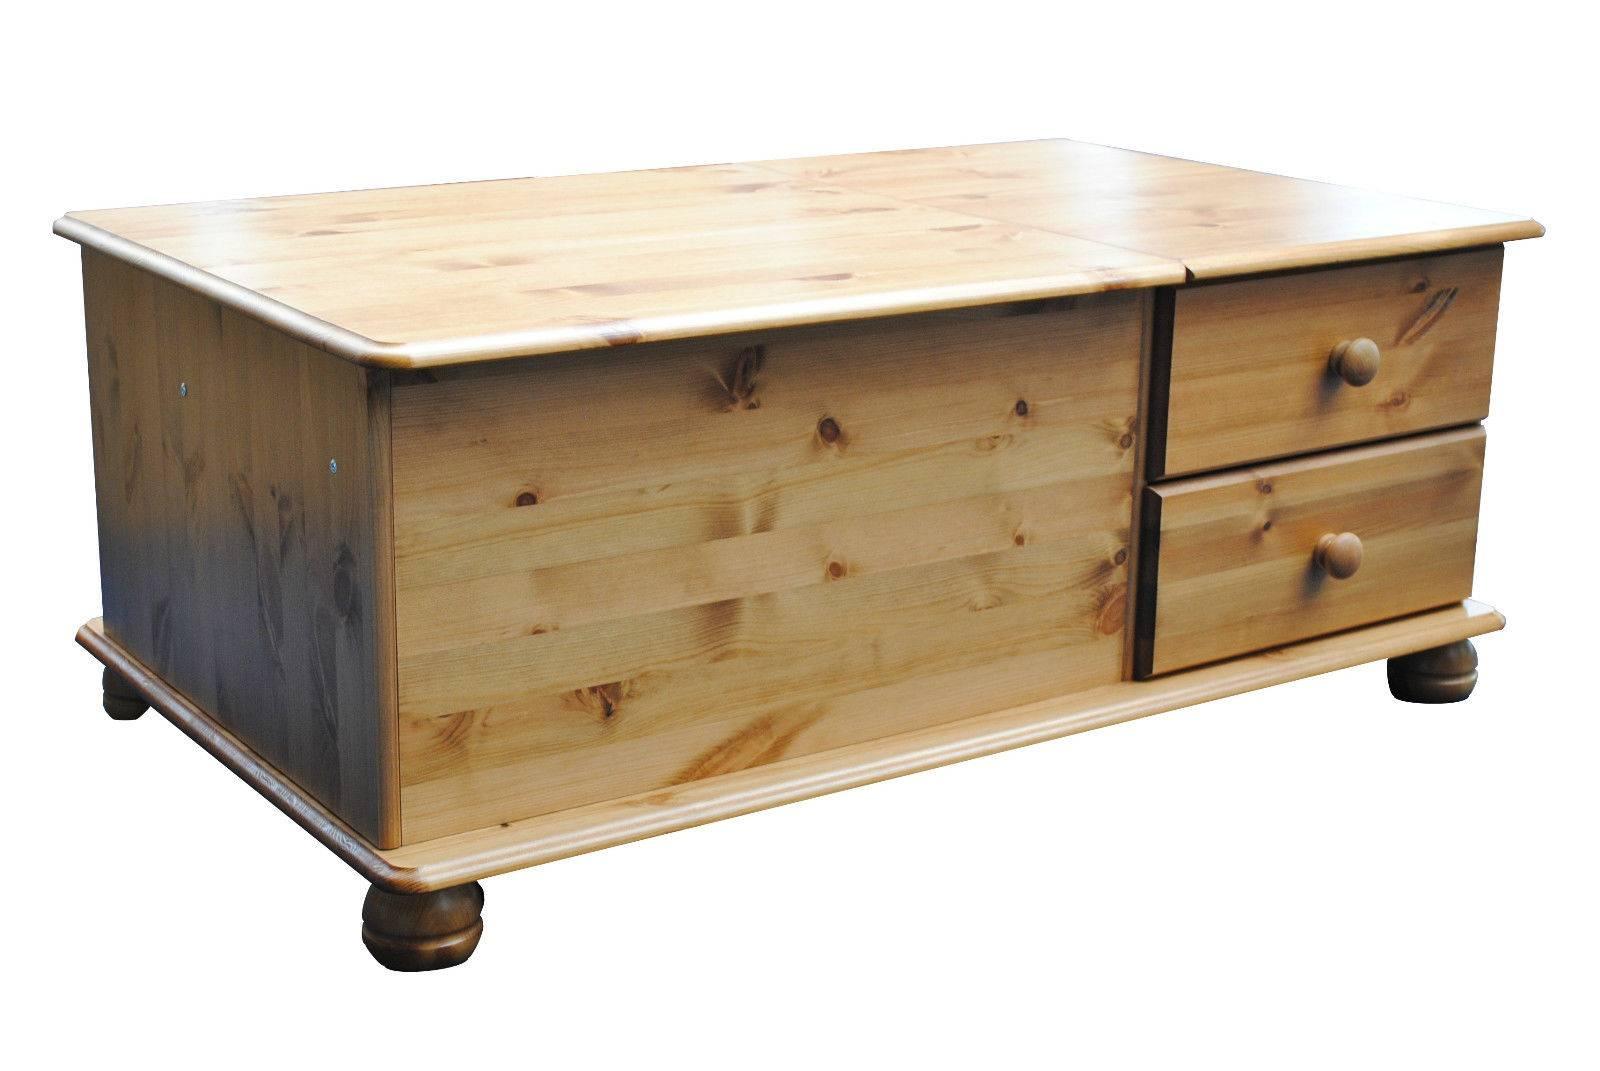 Storage Coffee Tables | Furniture | Ebay regarding Square Coffee Table With Storage Drawers (Image 12 of 15)